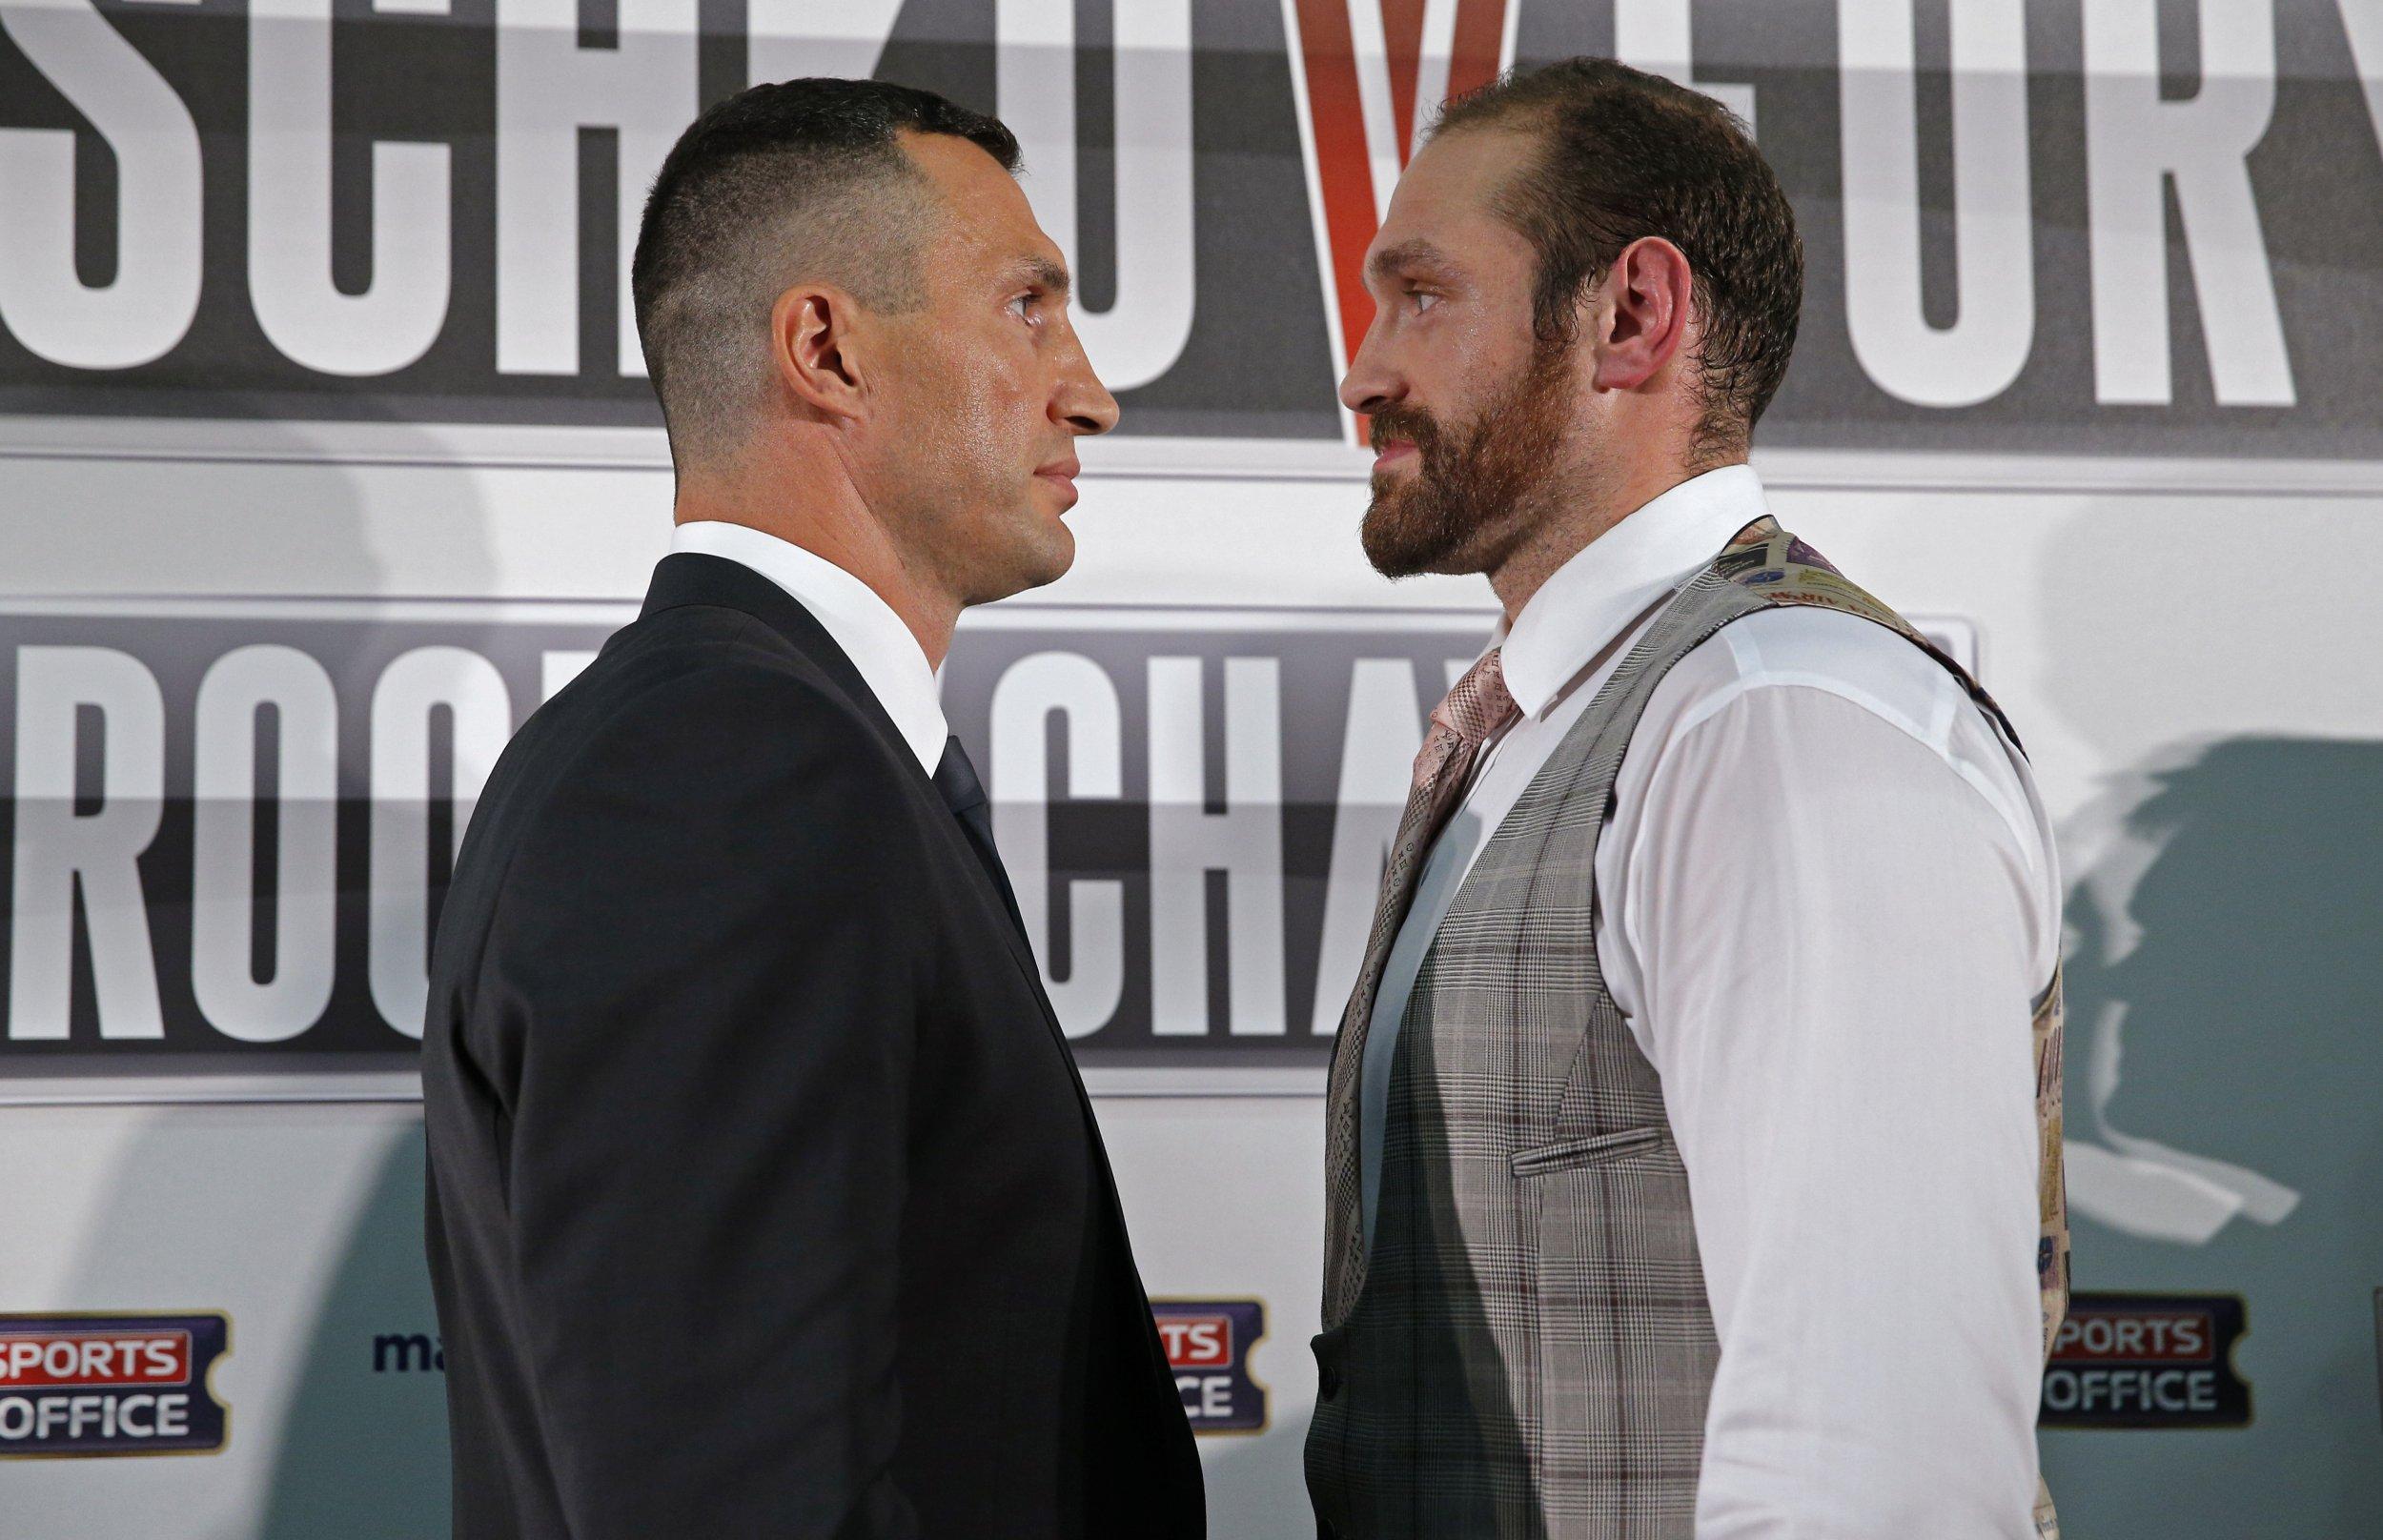 Wladimir Klitschko Postpones Heavyweight Title Fight Against Tyson Fury